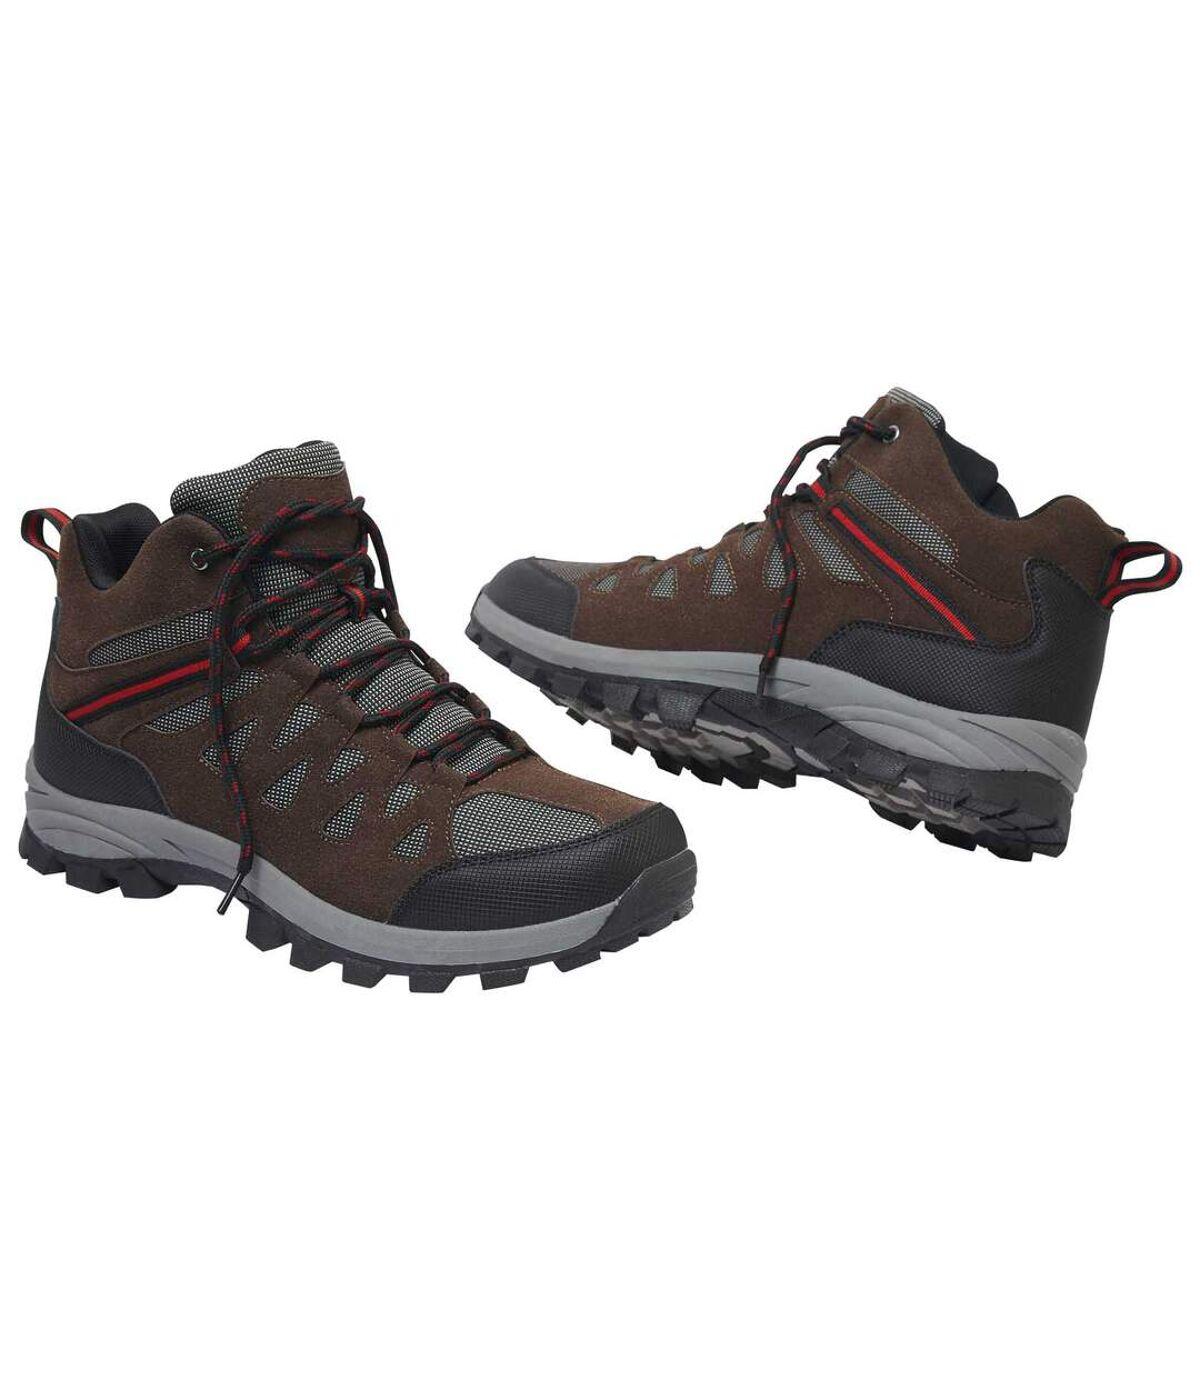 Outdoorové boty Raid Atlas For Men